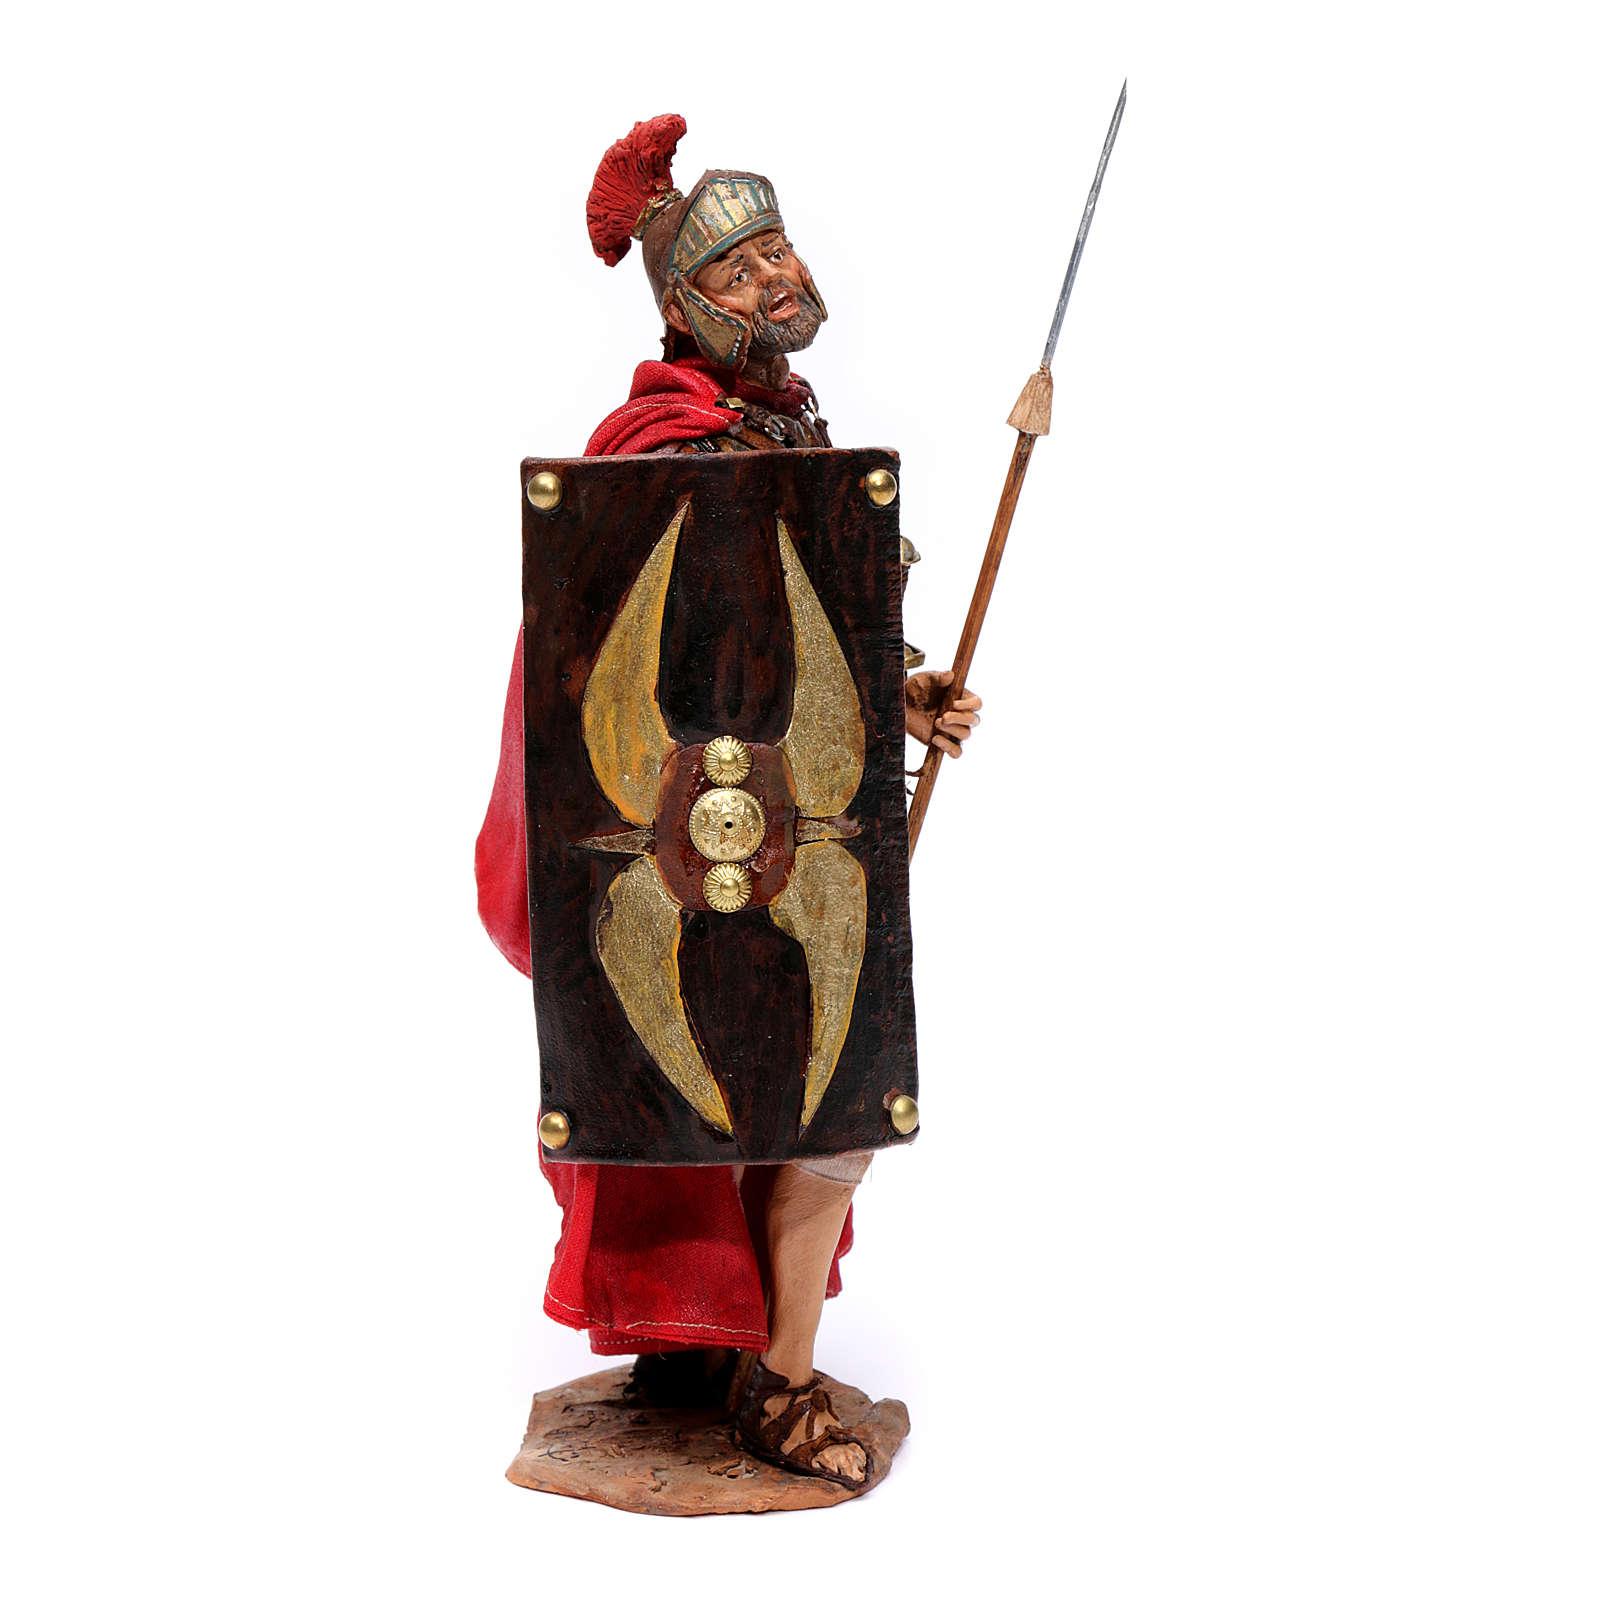 Soldato romano per presepe 18 cm Angela Tripi 4